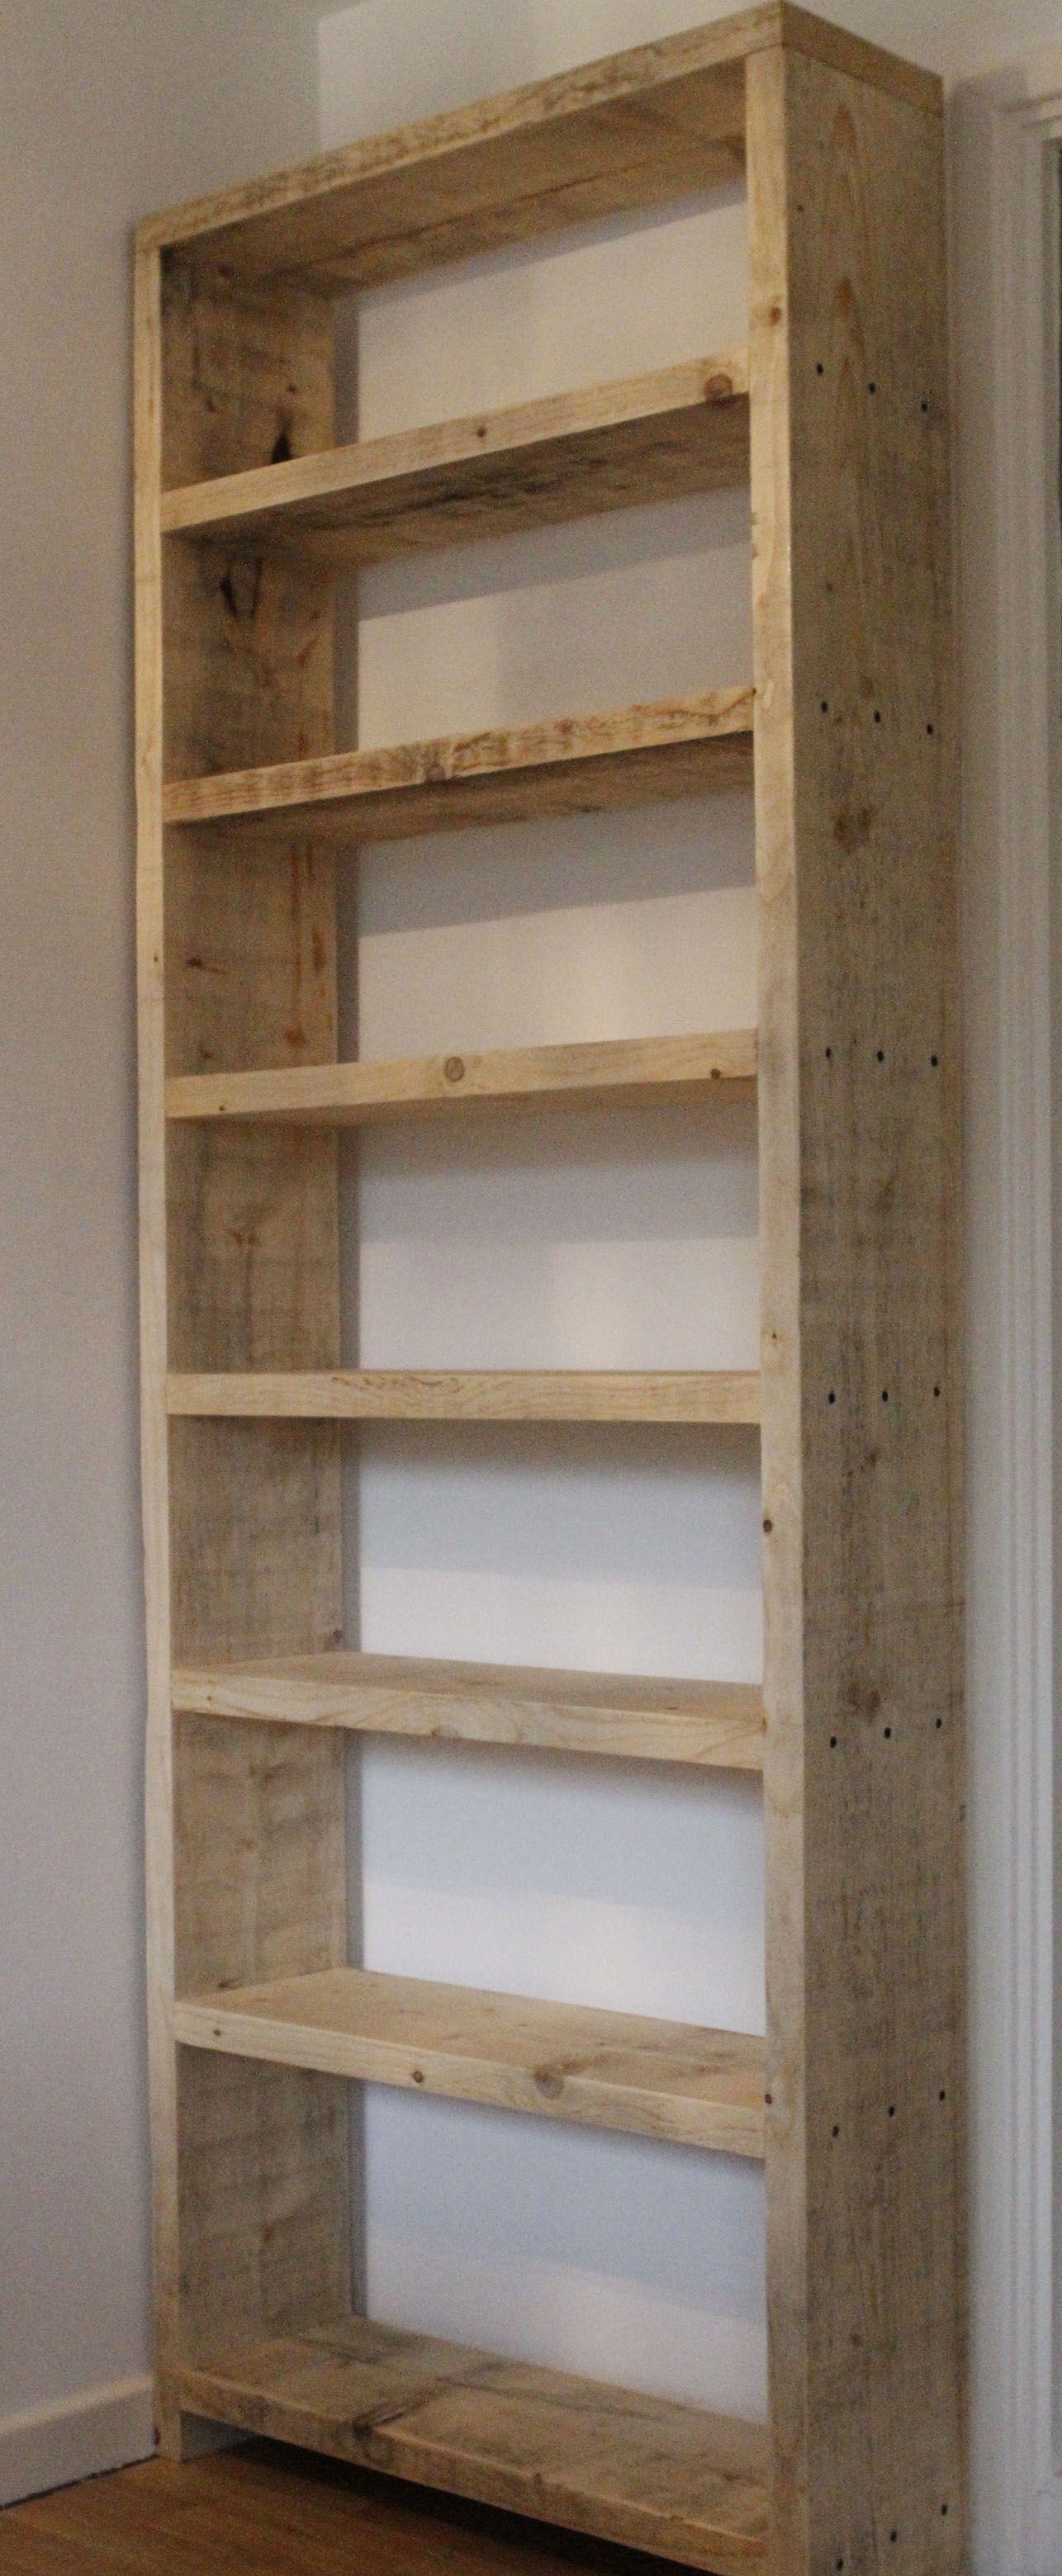 wel e to relic interiors cheap shelves wood screws and wood shelf